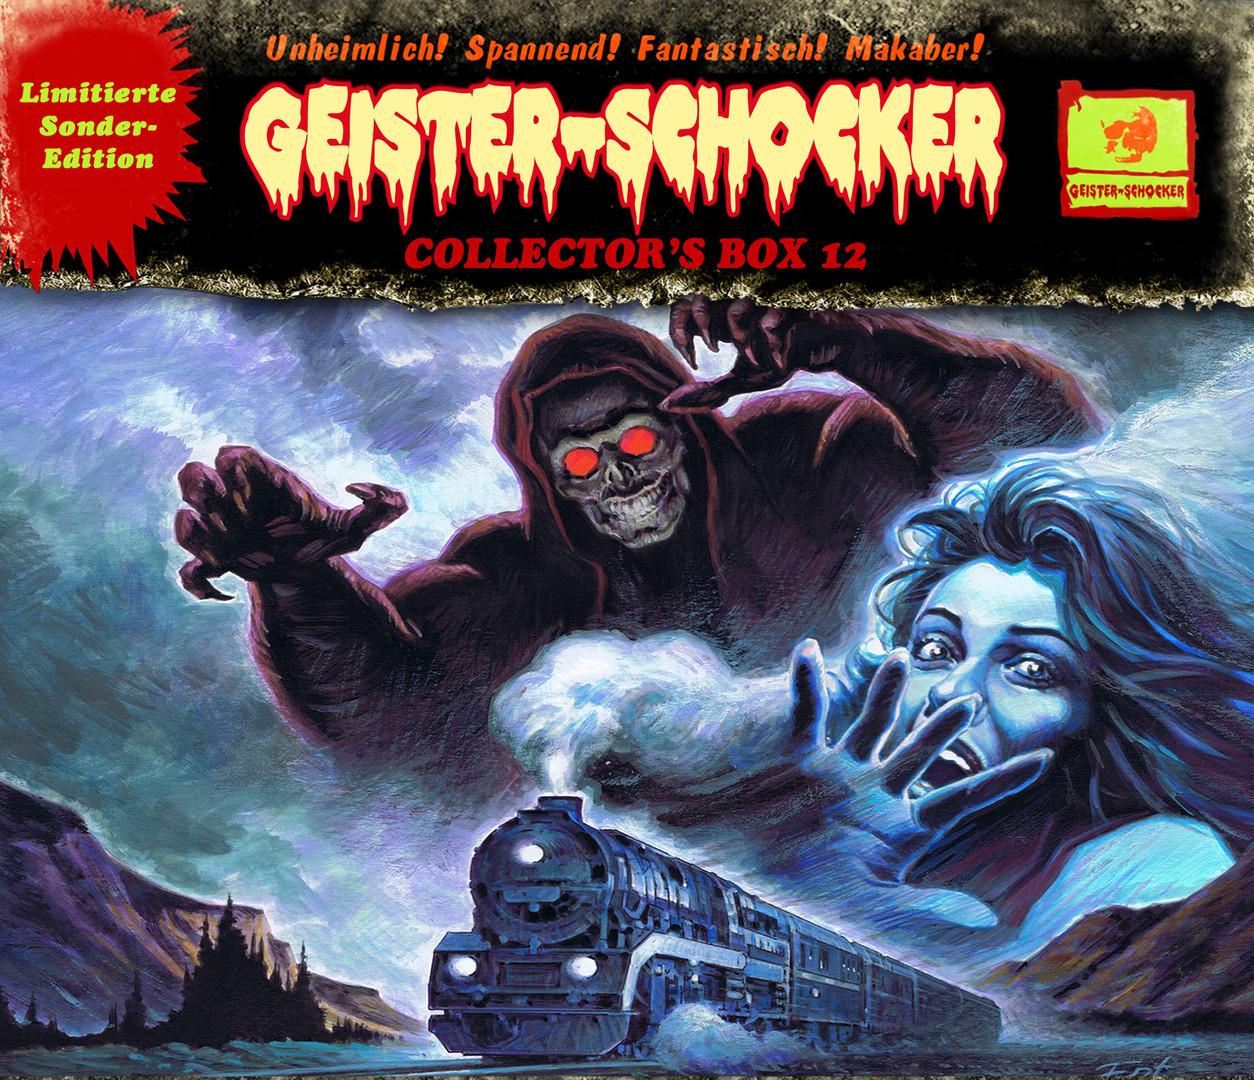 Geister-Schocker Collector's Box 12 (Folge 32-34)